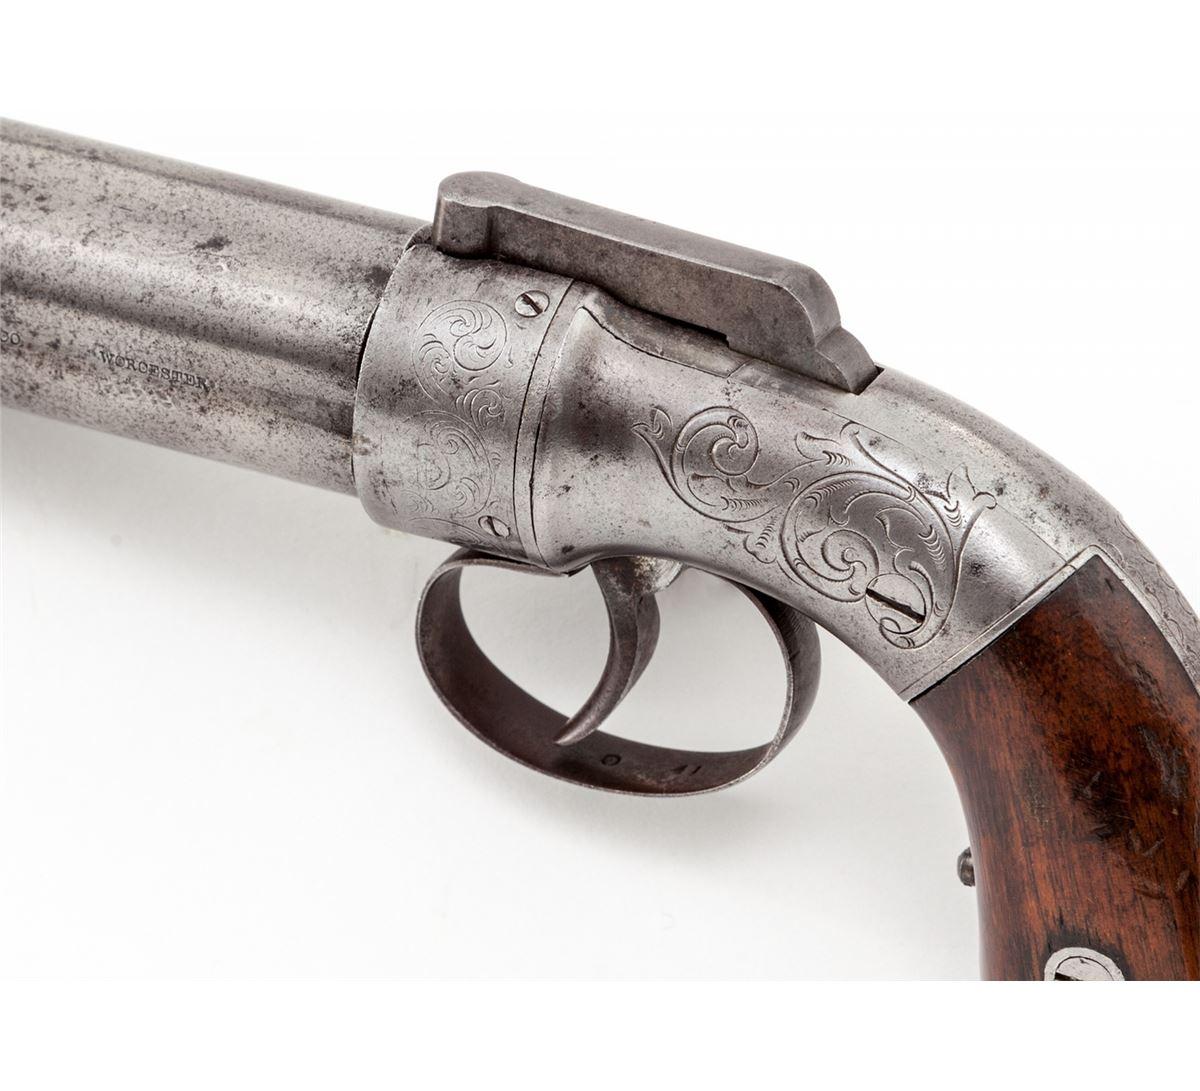 Images of Allen & Thurber Pepperbox Pistol   1200x1091